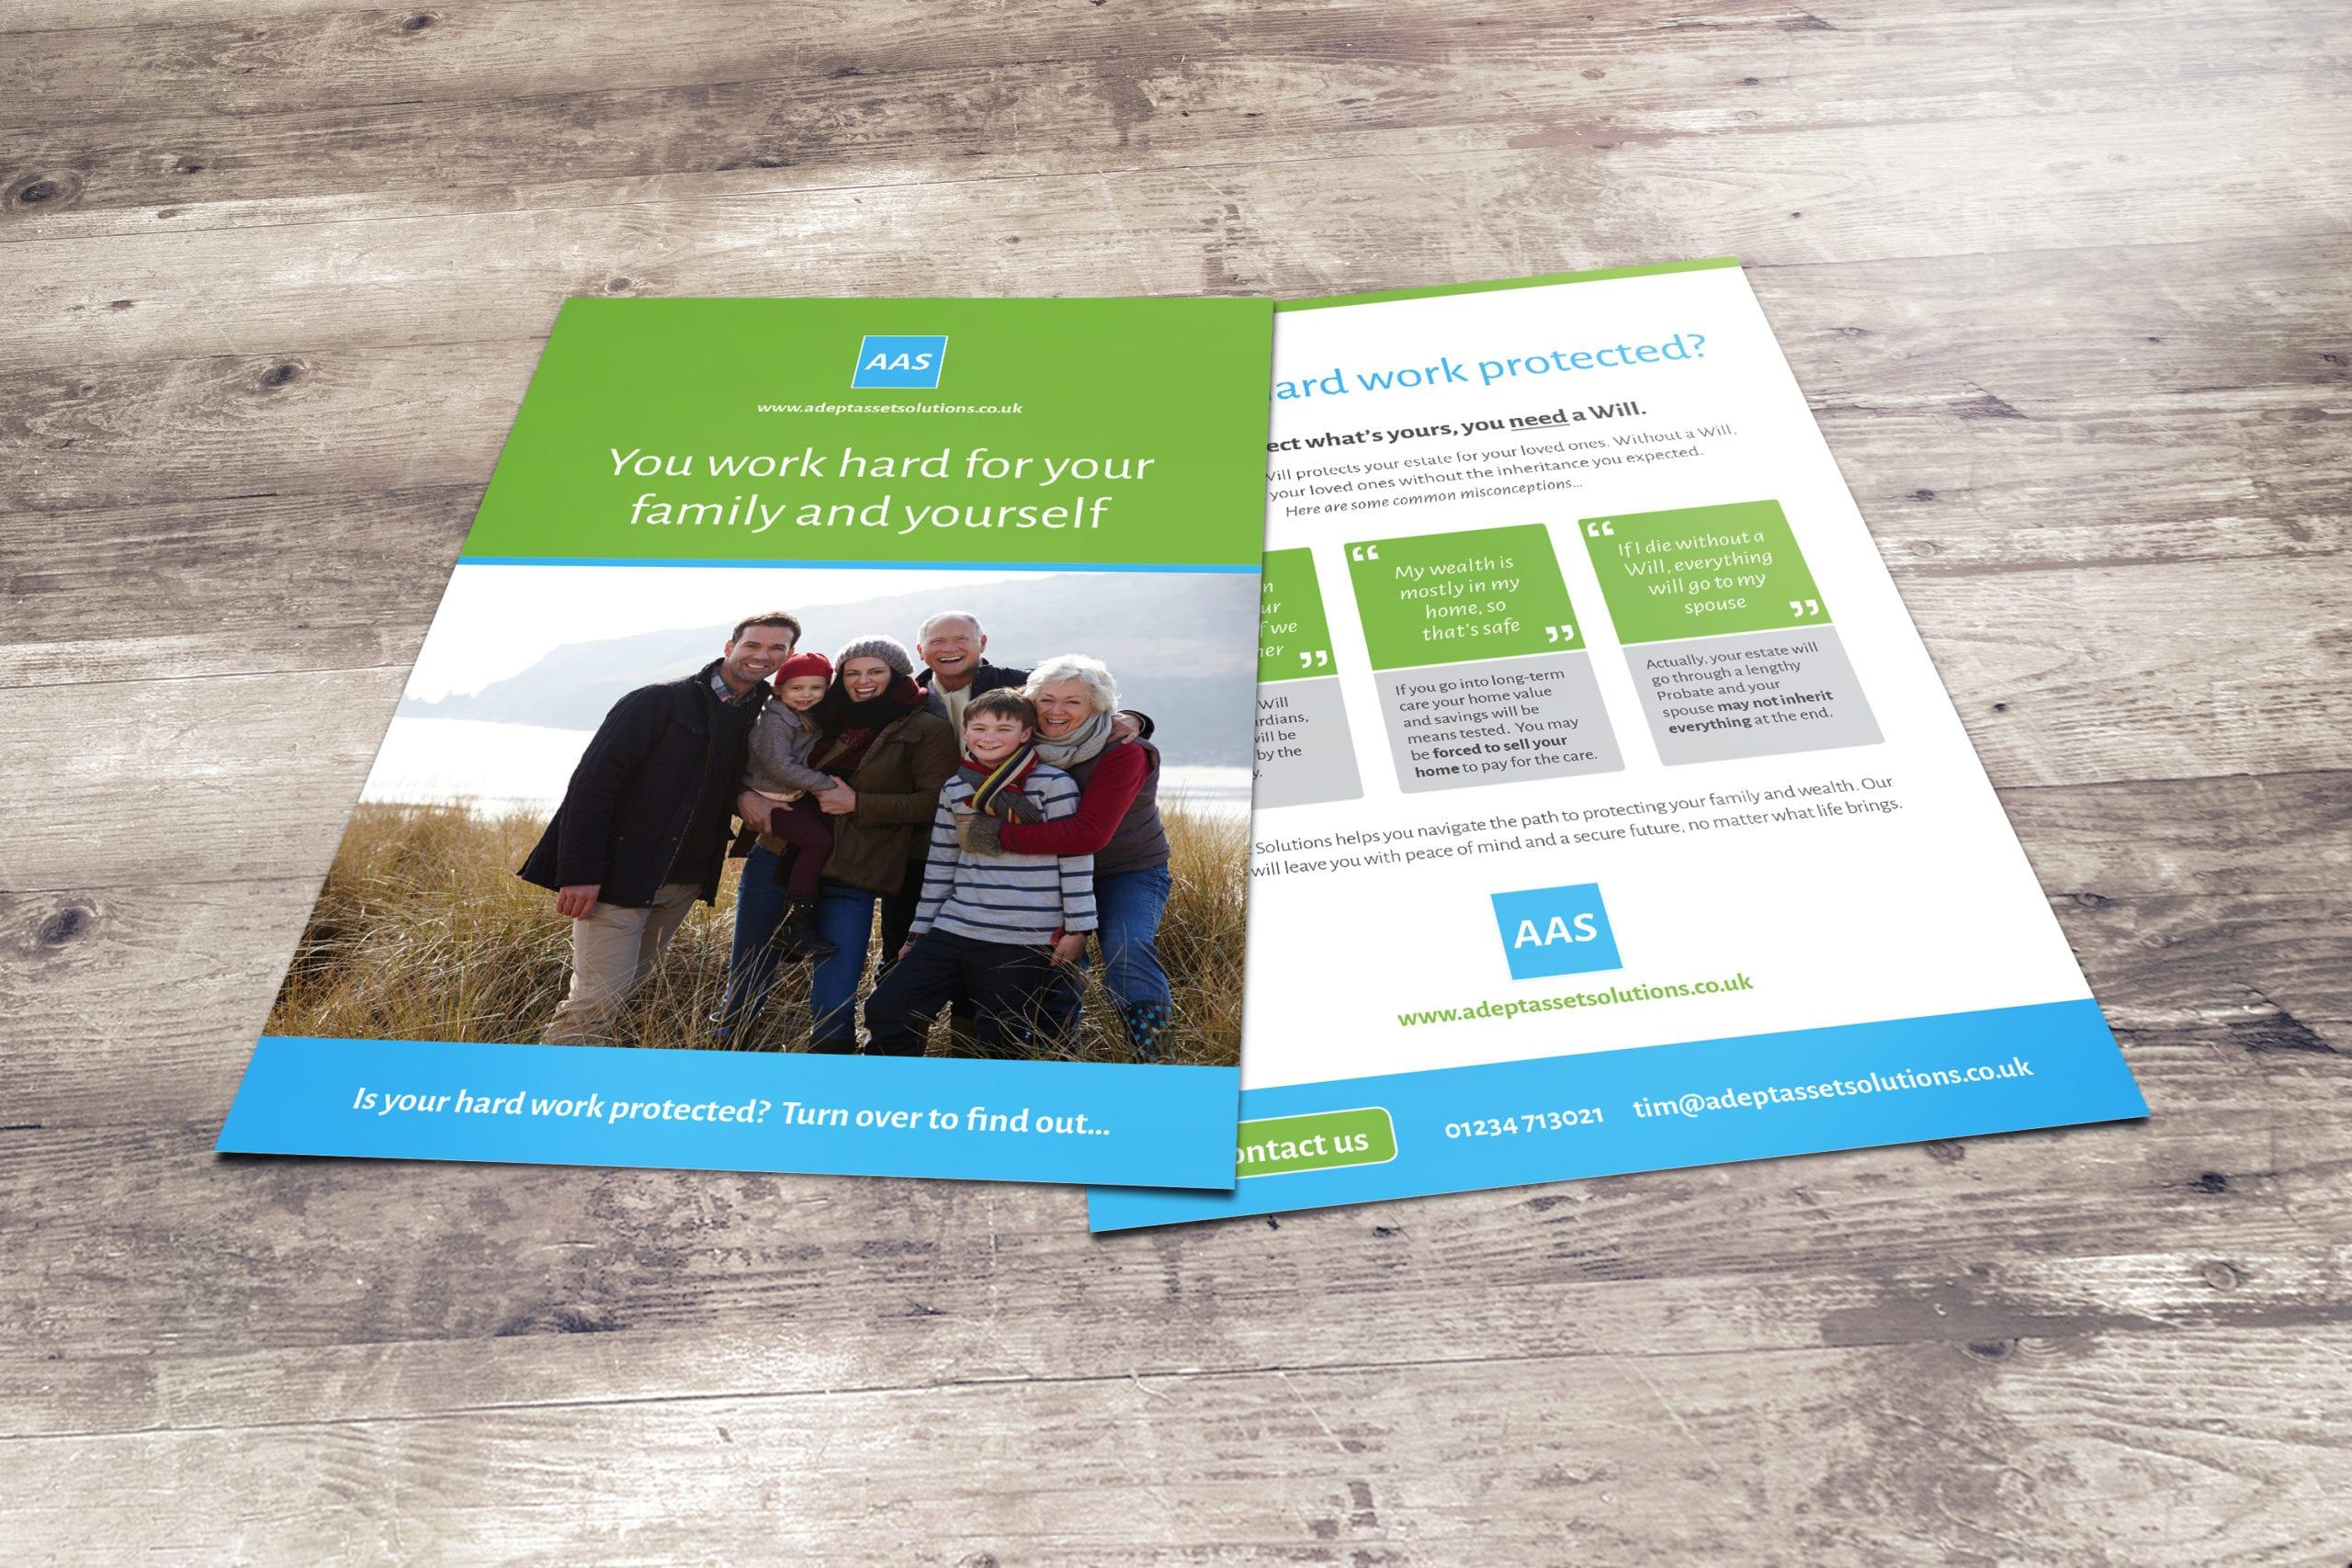 Design for a wills and estates leaflet for Adept Asset Solutions